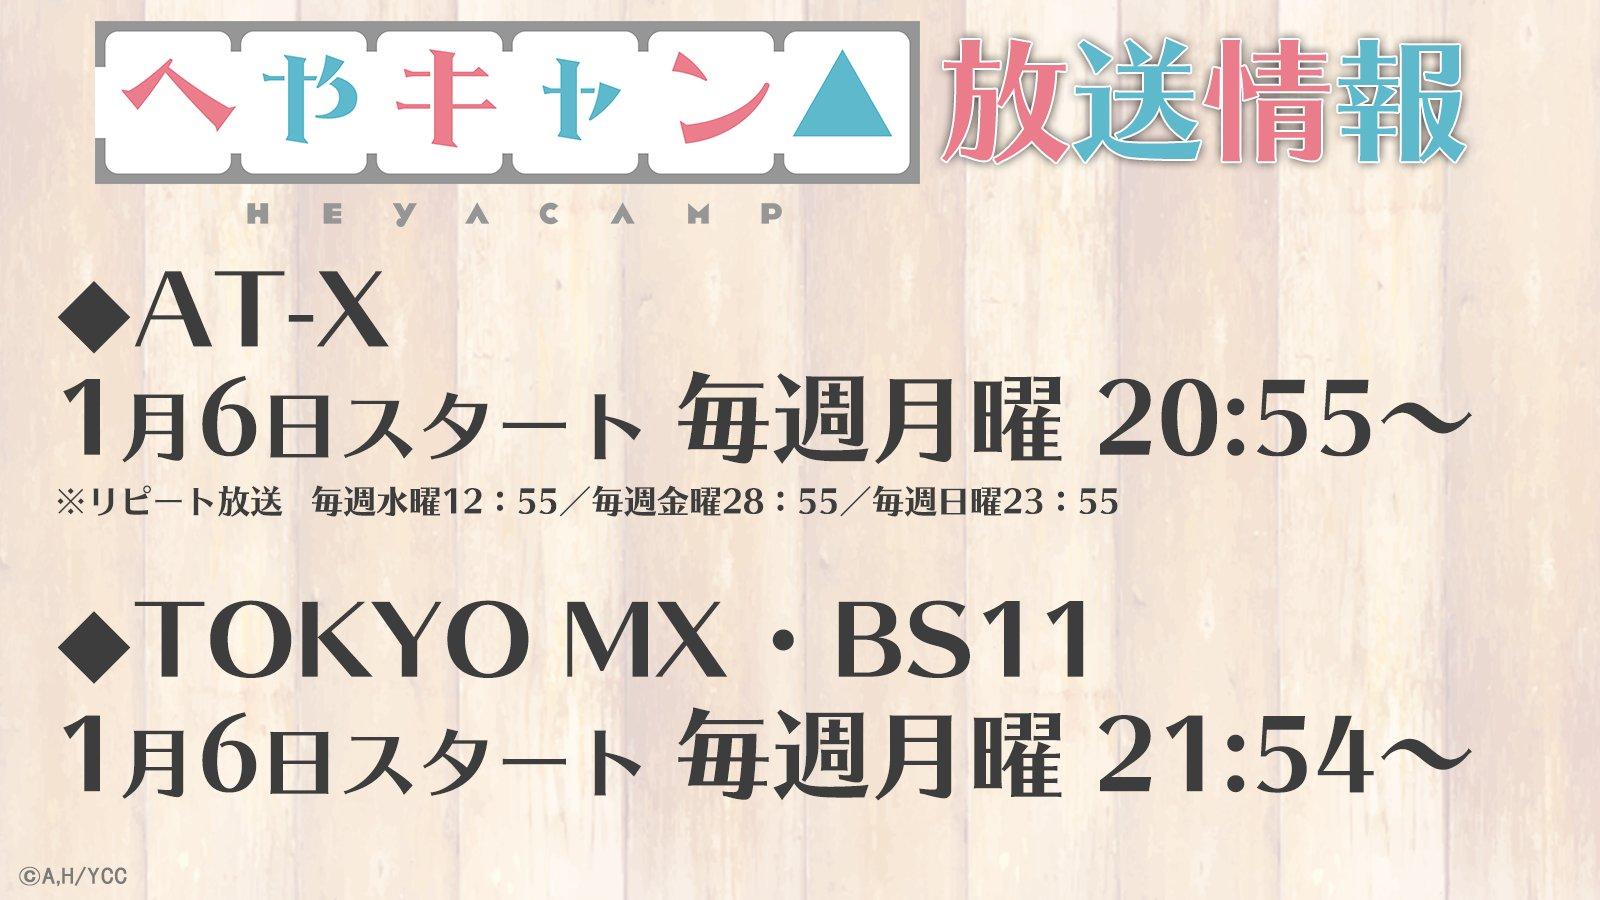 yurucamp_anime 1195265284963106817_p0